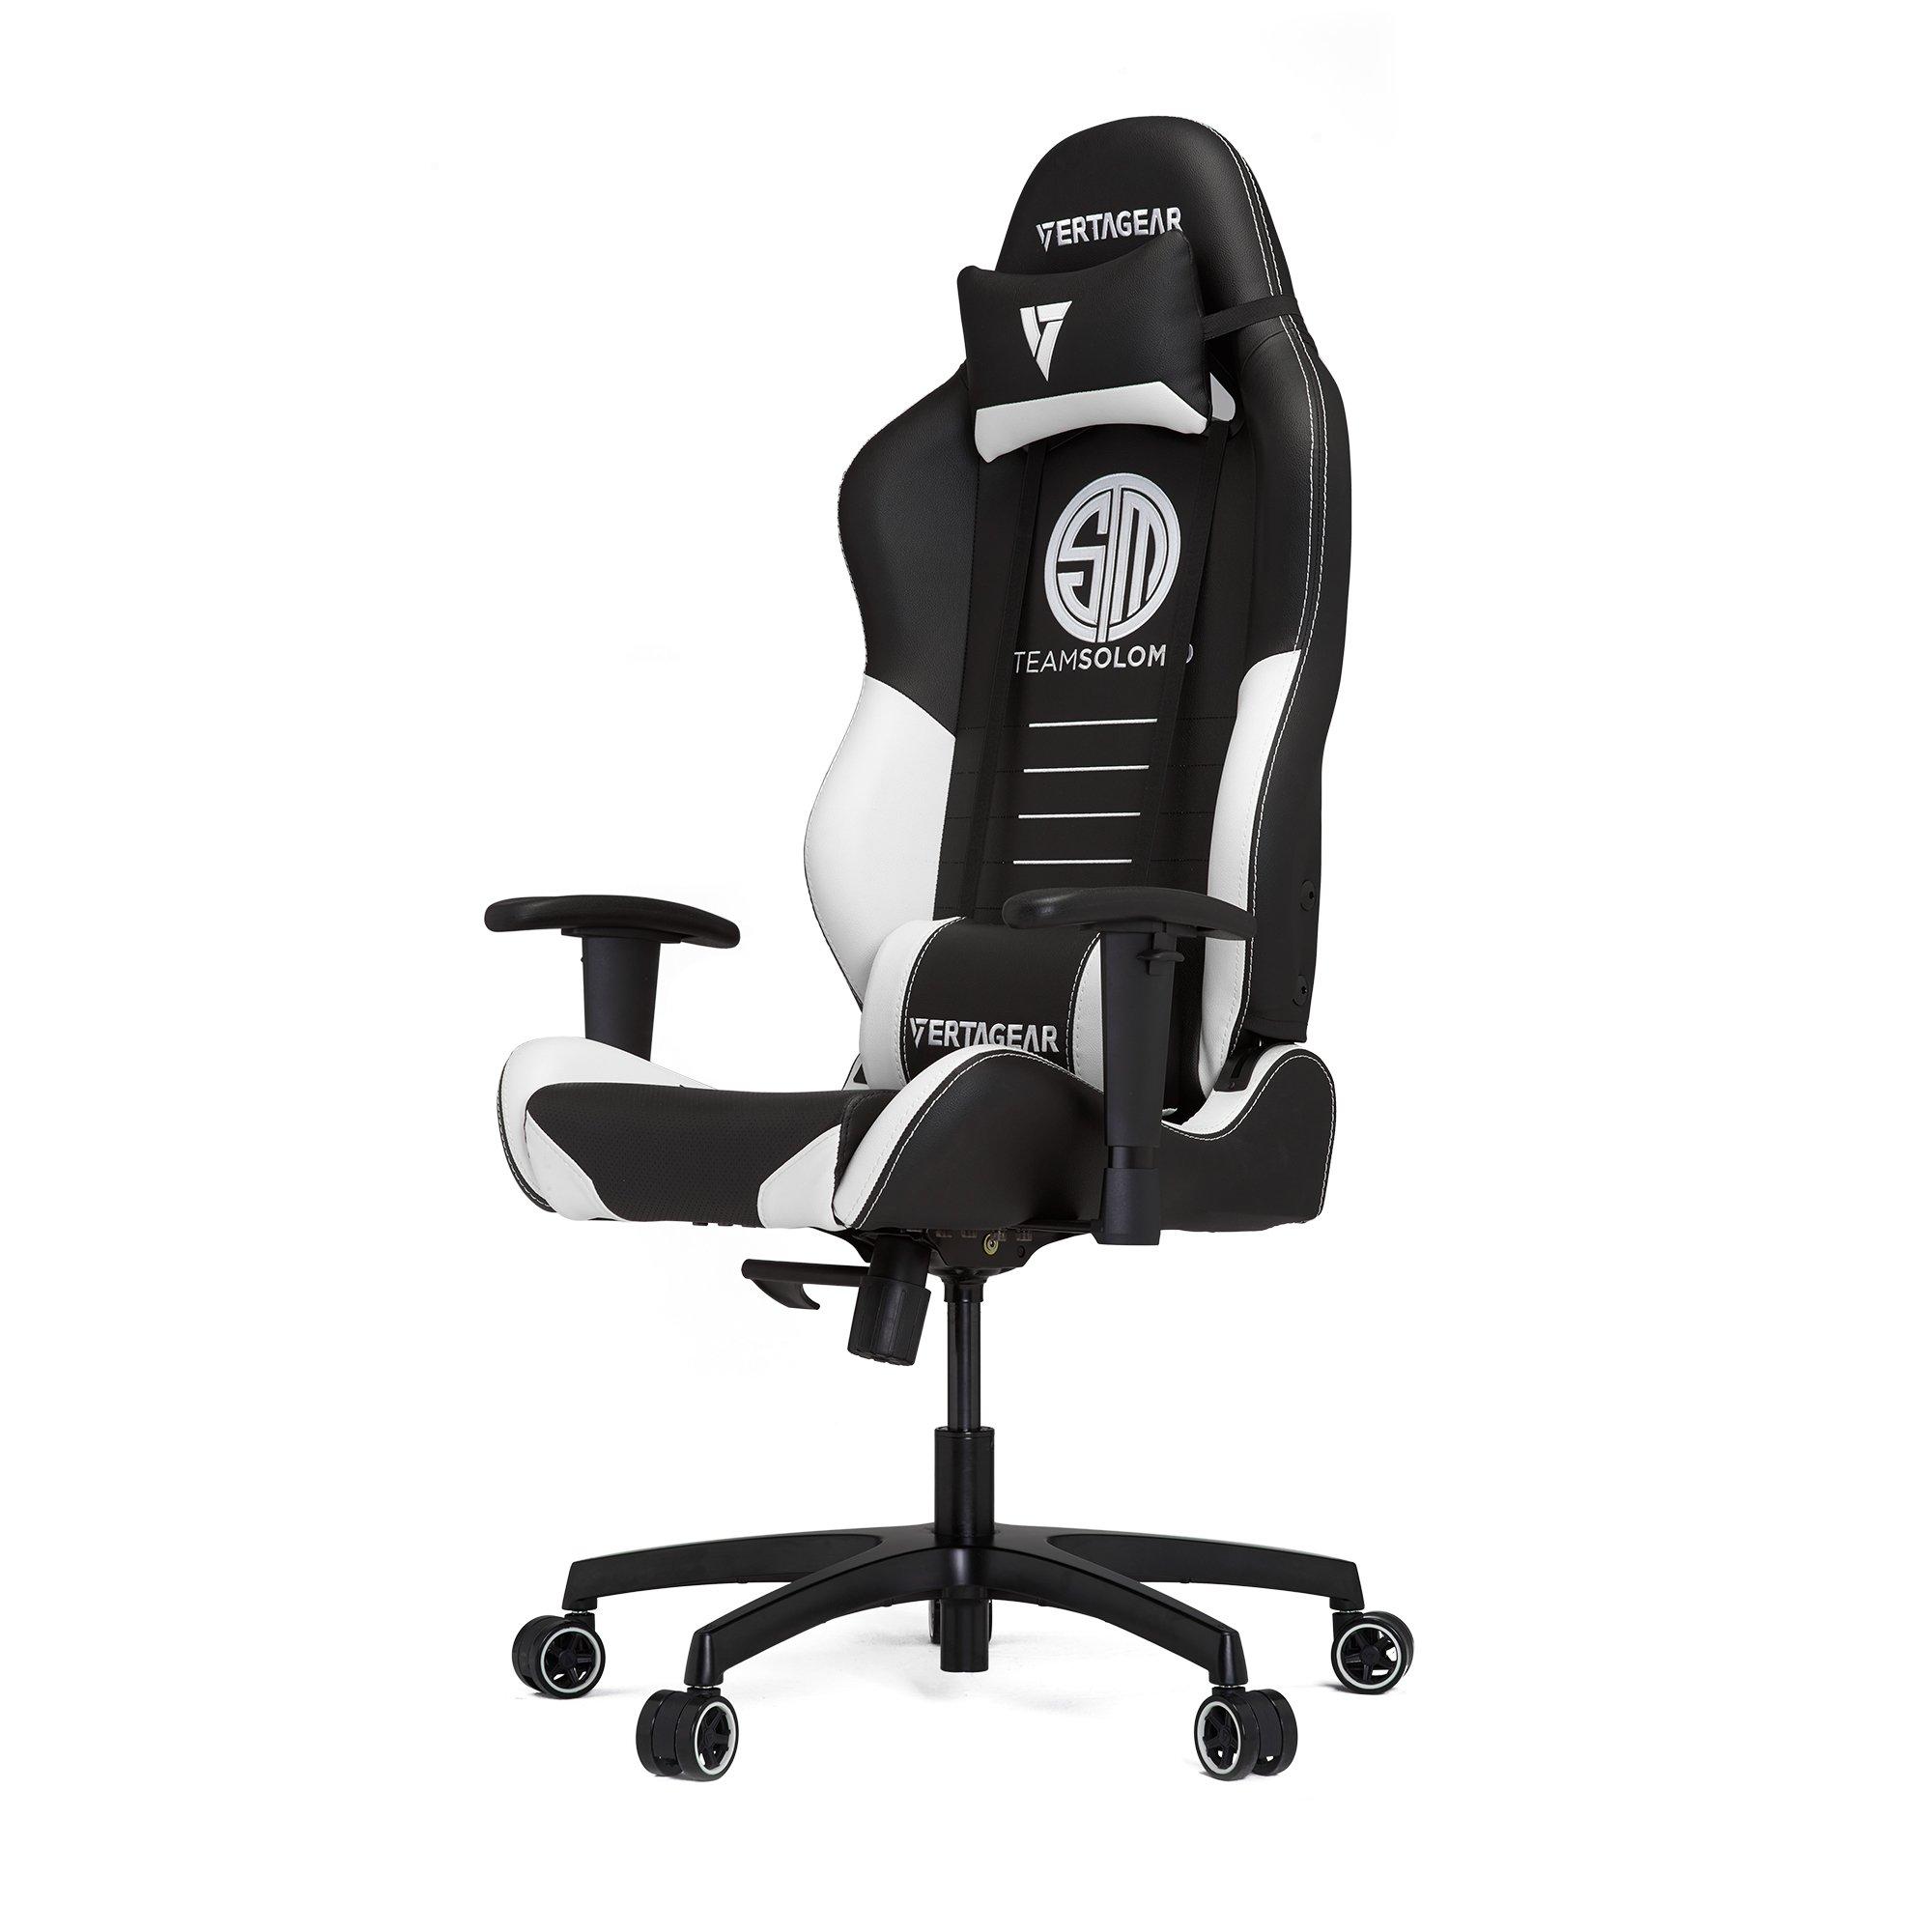 Vertagear TSM Racing Series Gaming Chair,Large,Black/White by VERTAGEAR